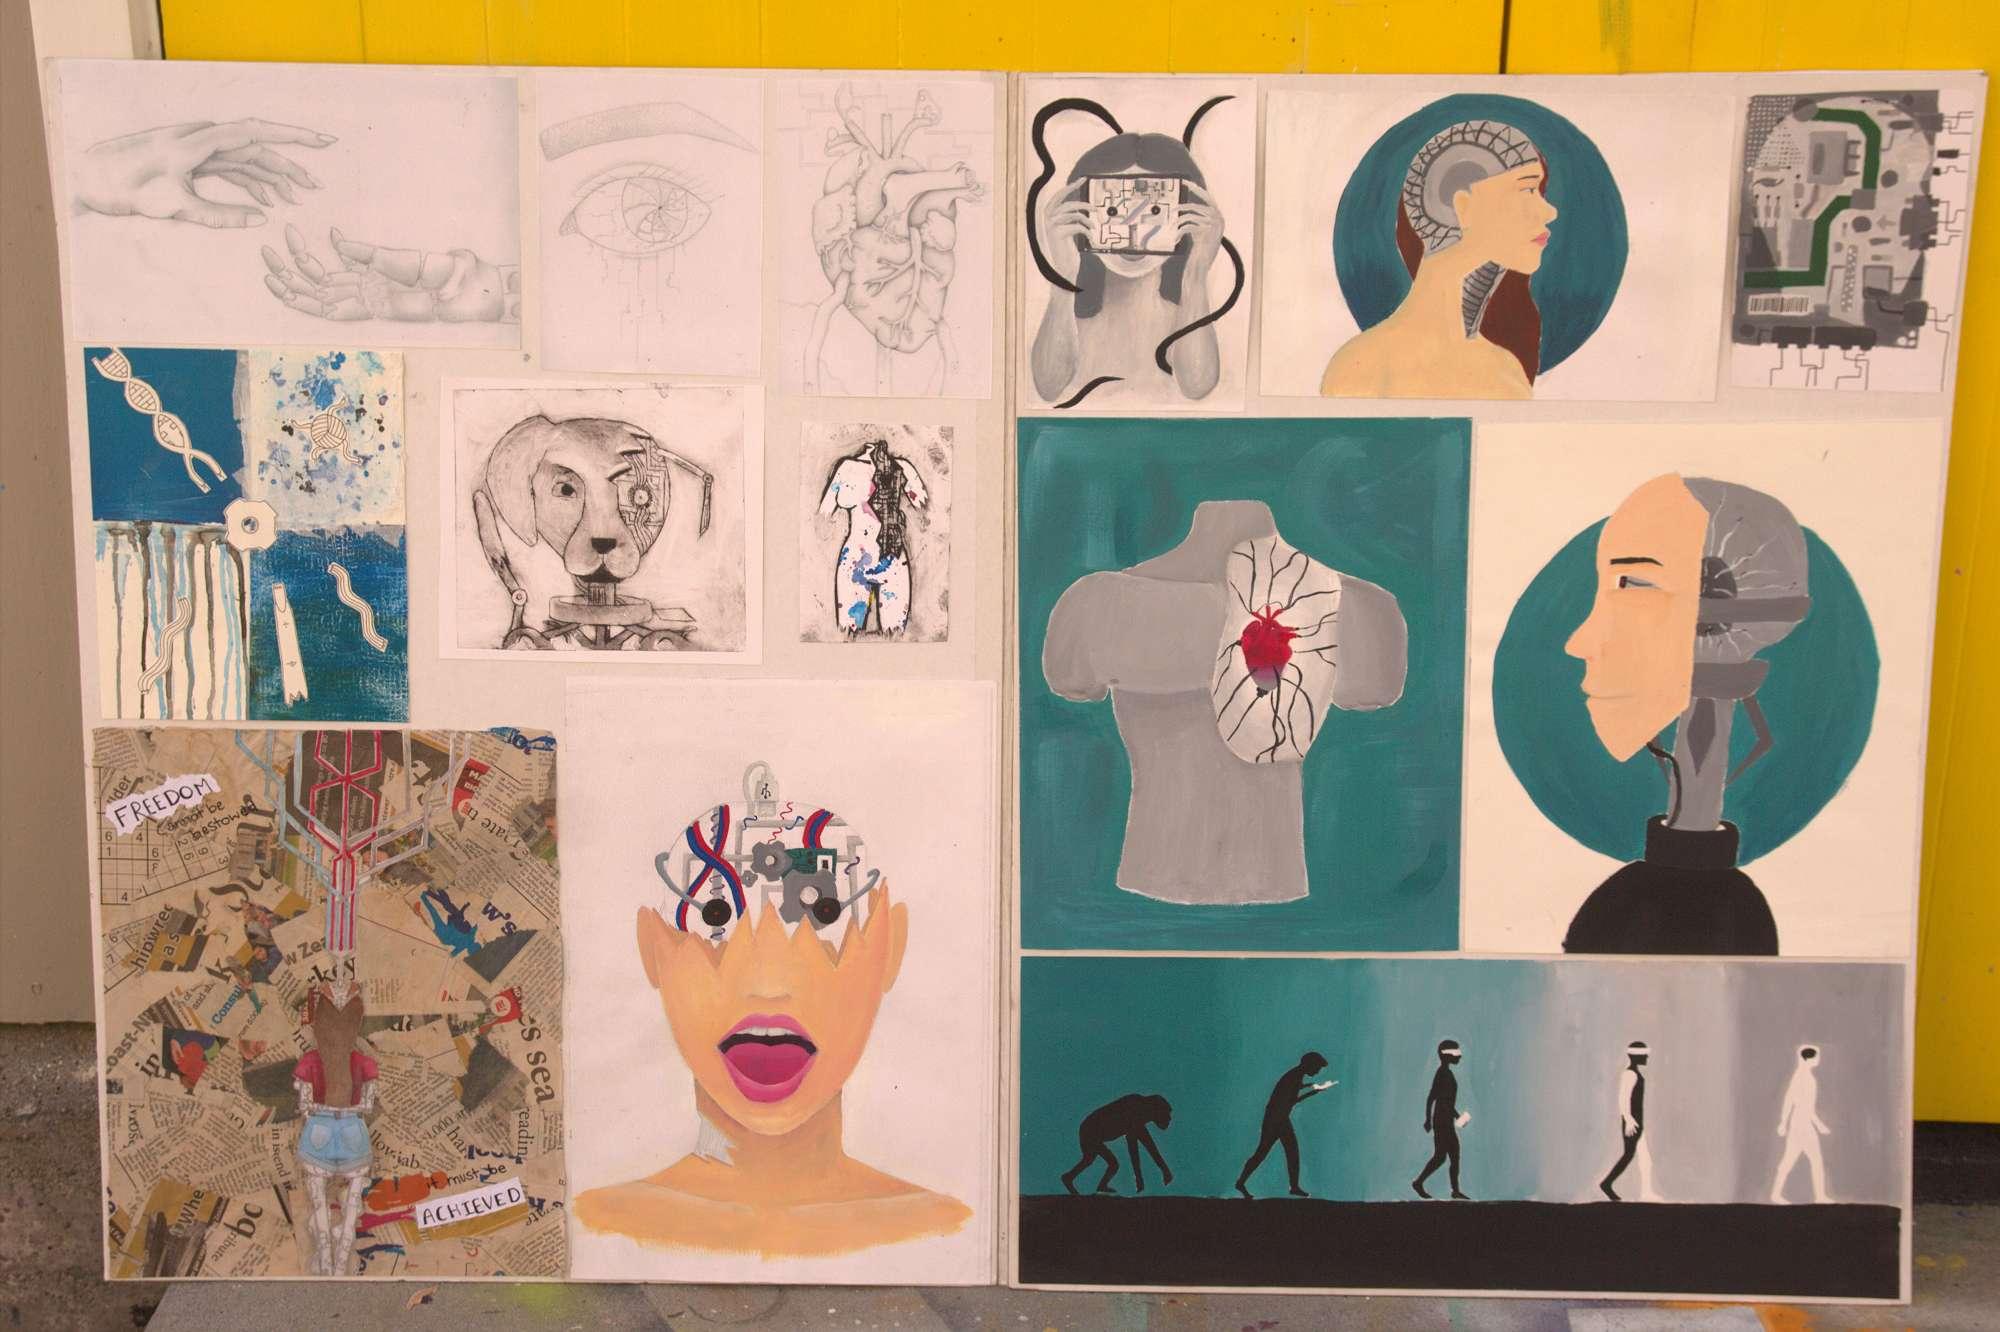 Ruahine Farrant - NCEA Level 1 Art portfolio